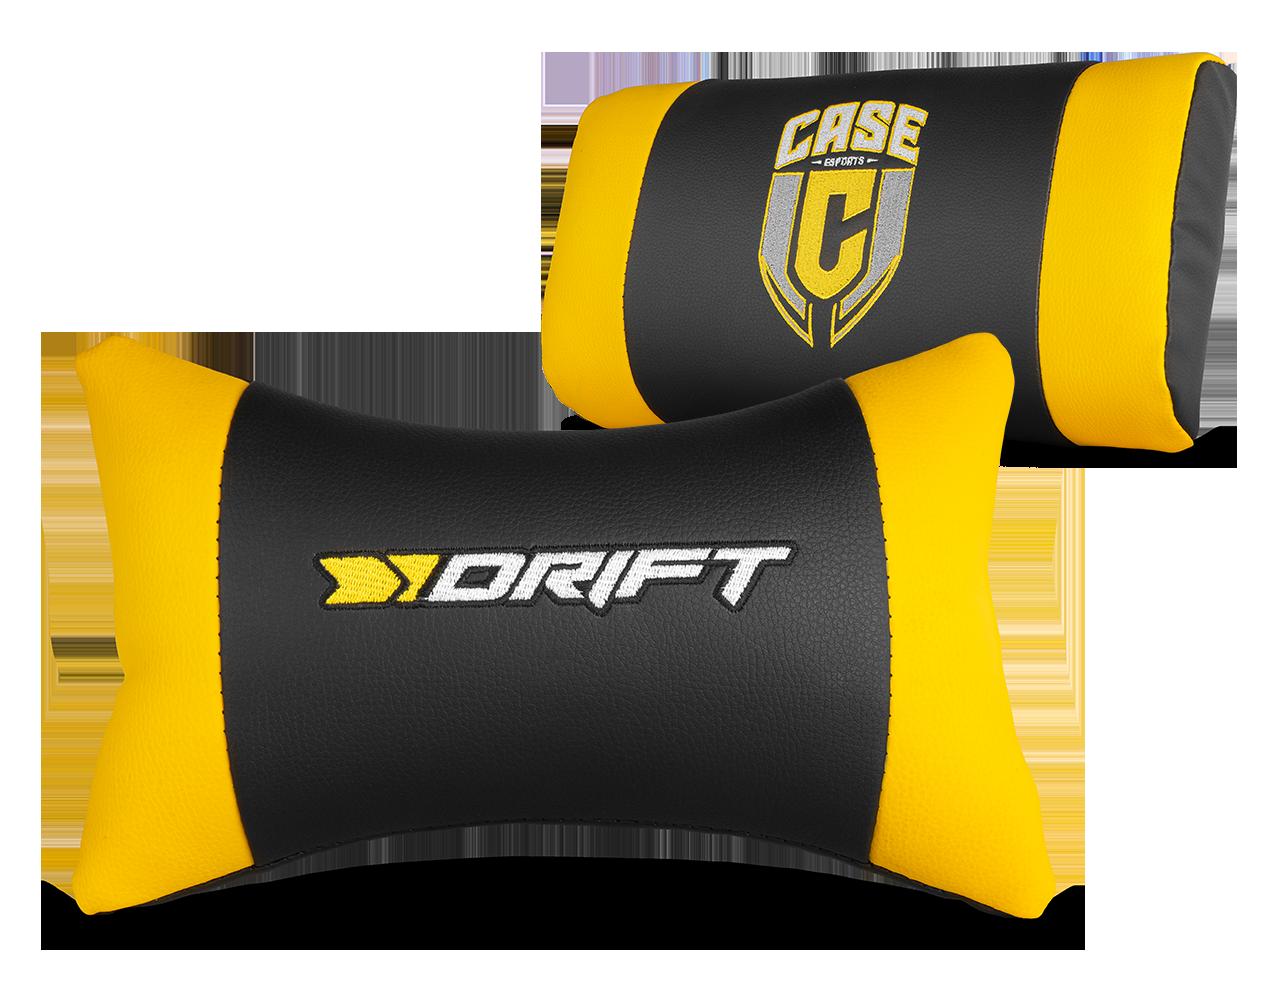 Drift Case Esports